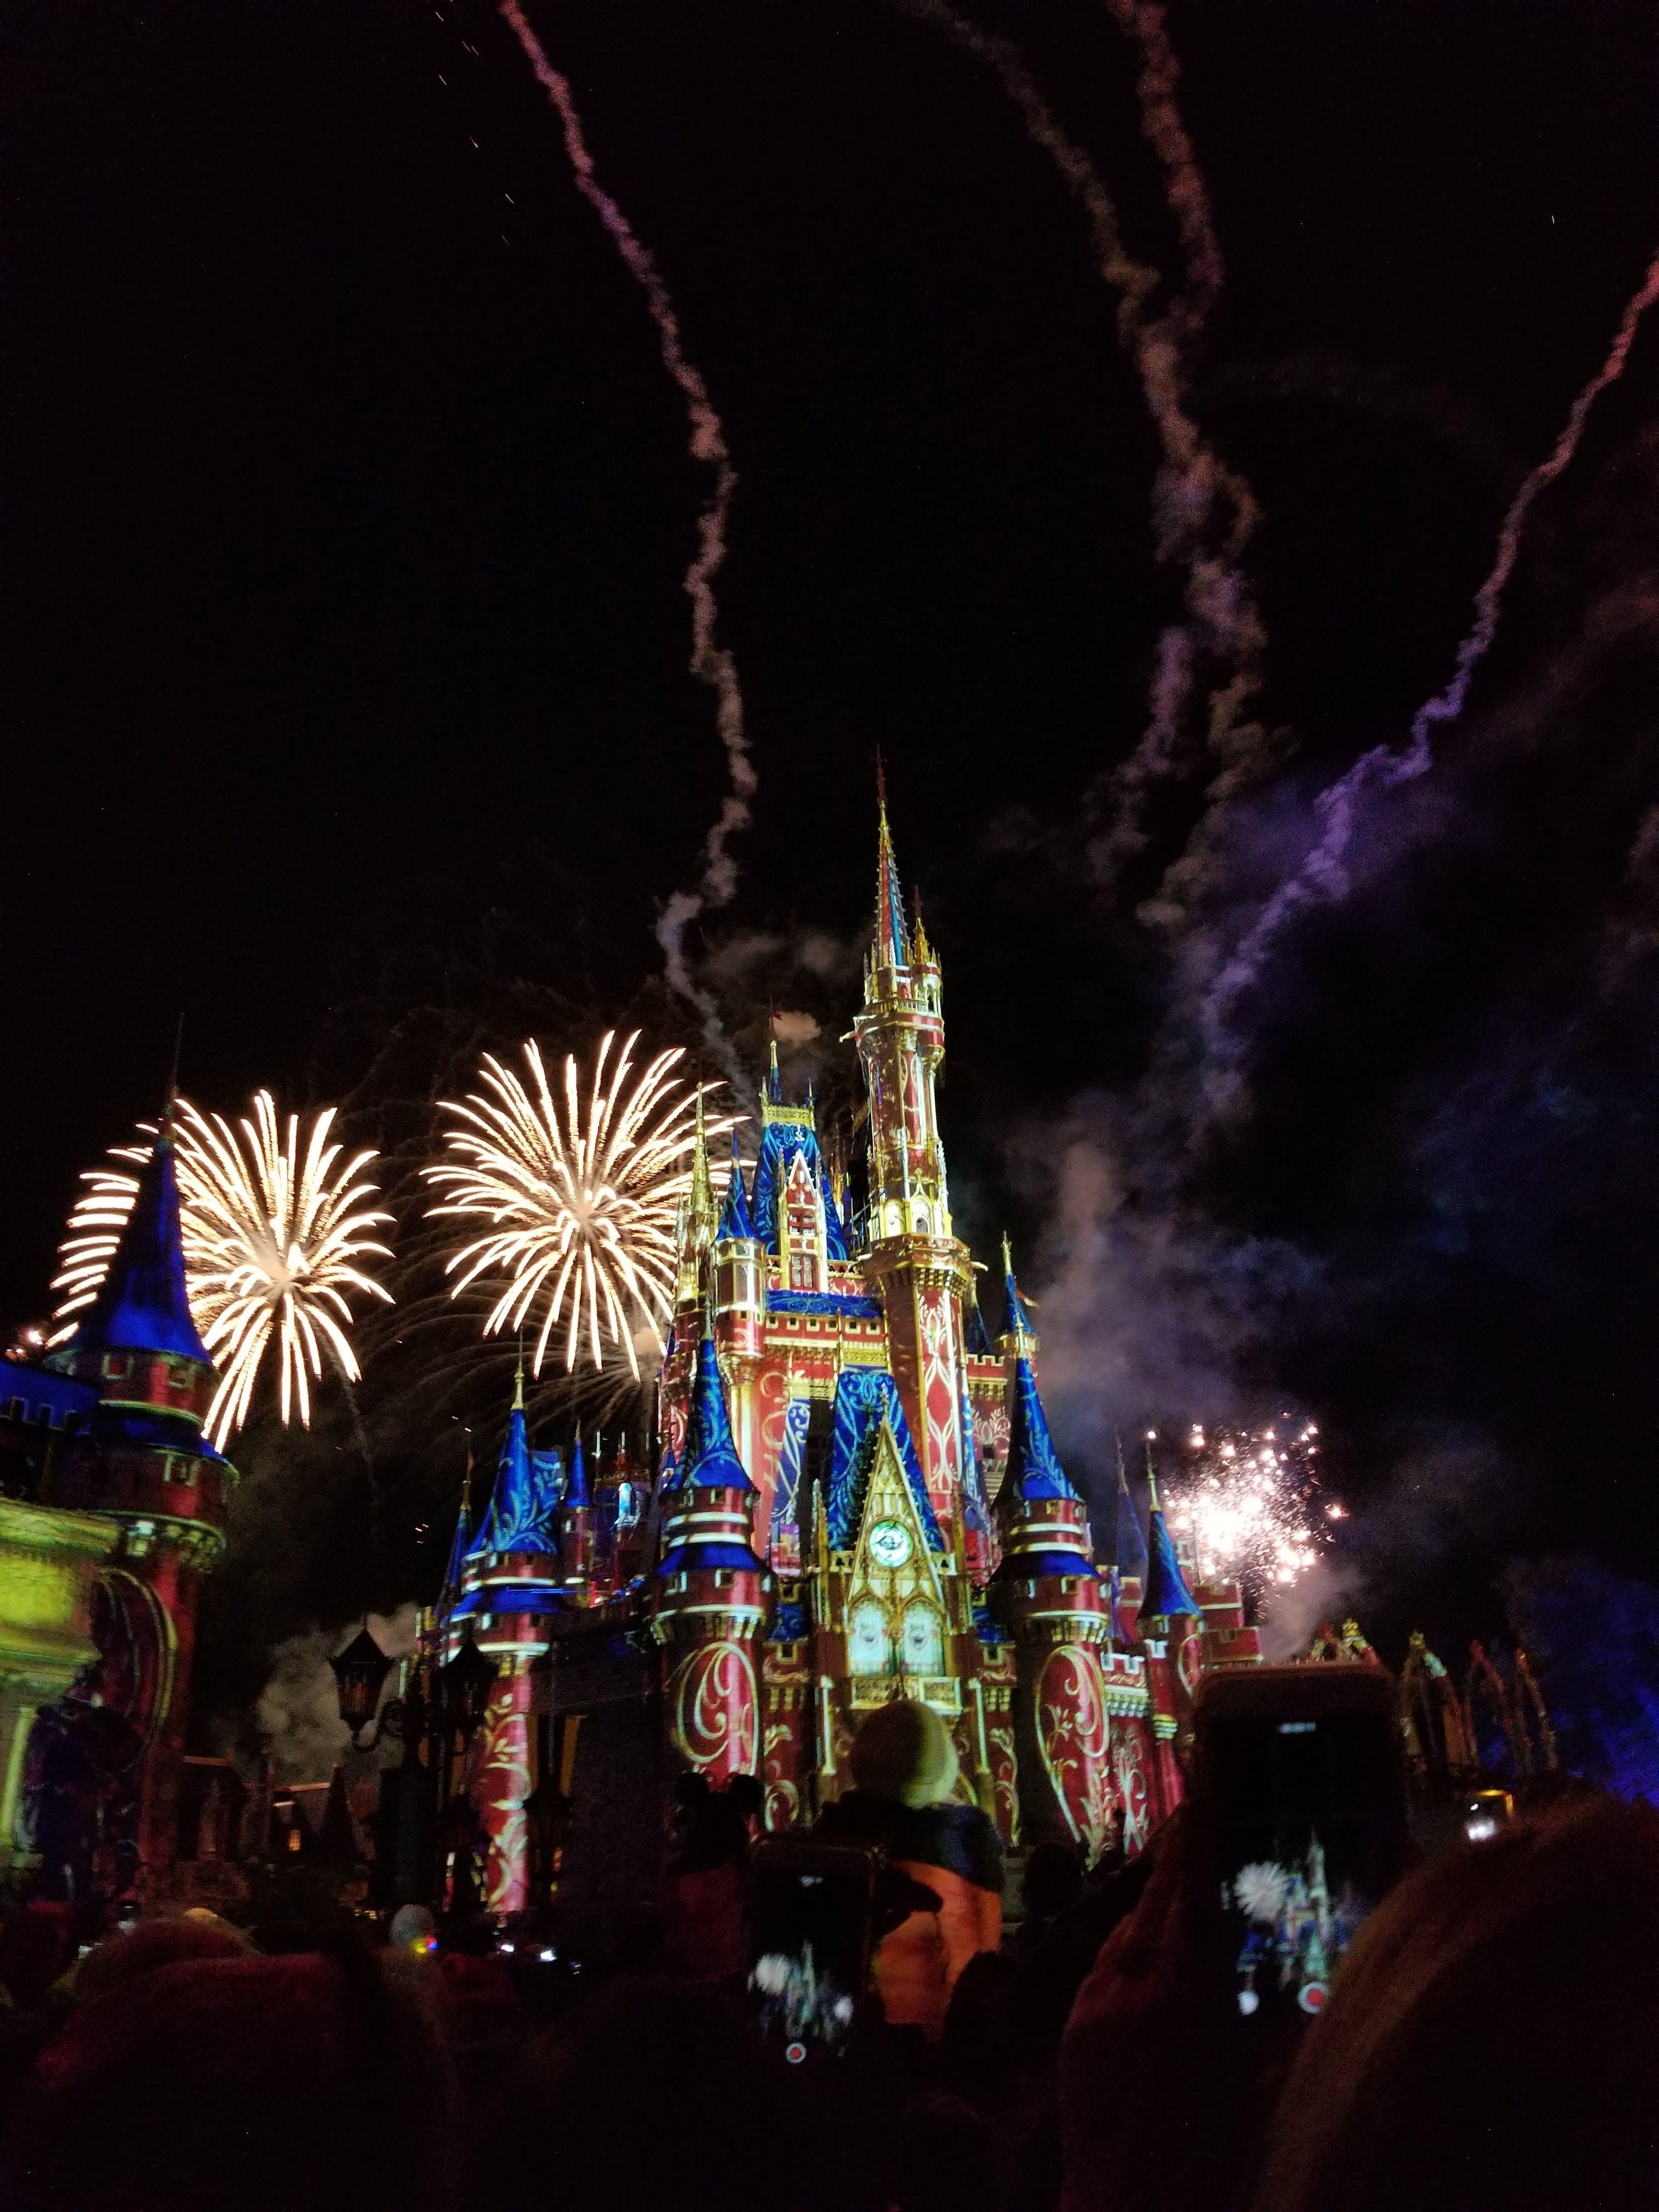 Photograph Of Disneyland